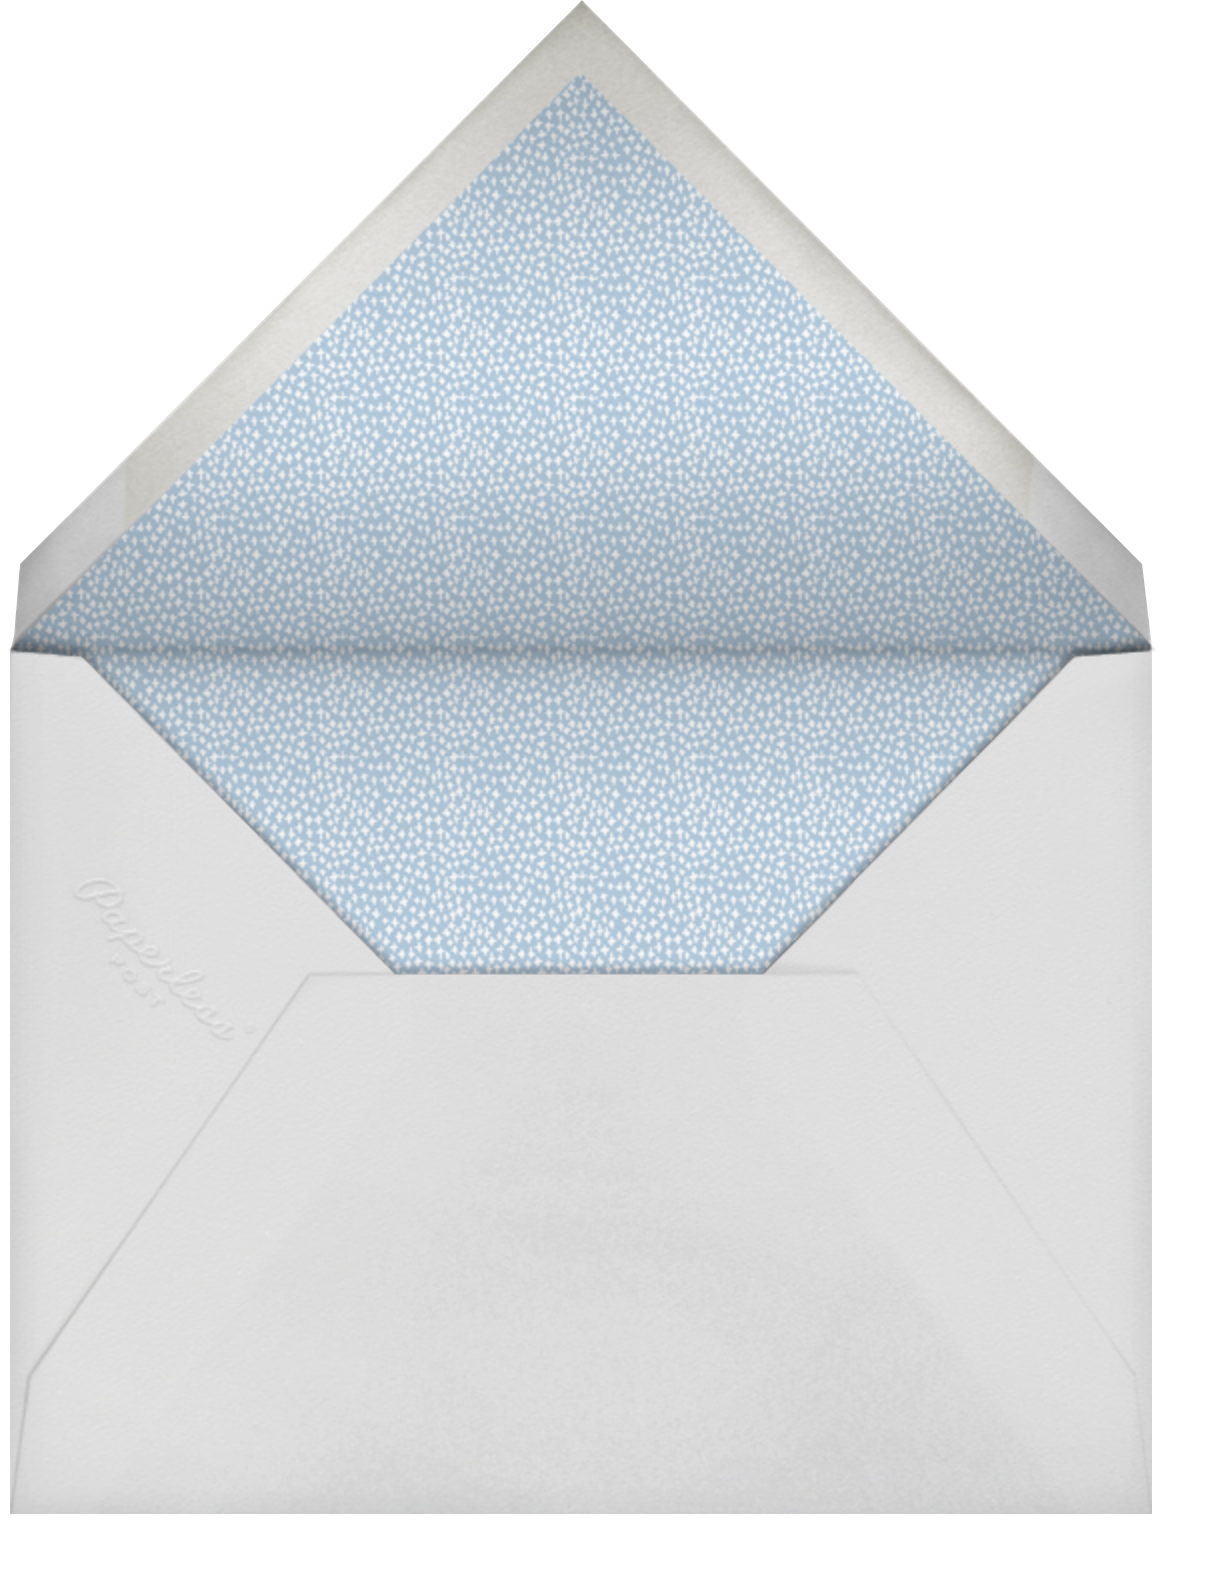 Among the Daisies - Tundra - Mr. Boddington's Studio - Save the date - envelope back